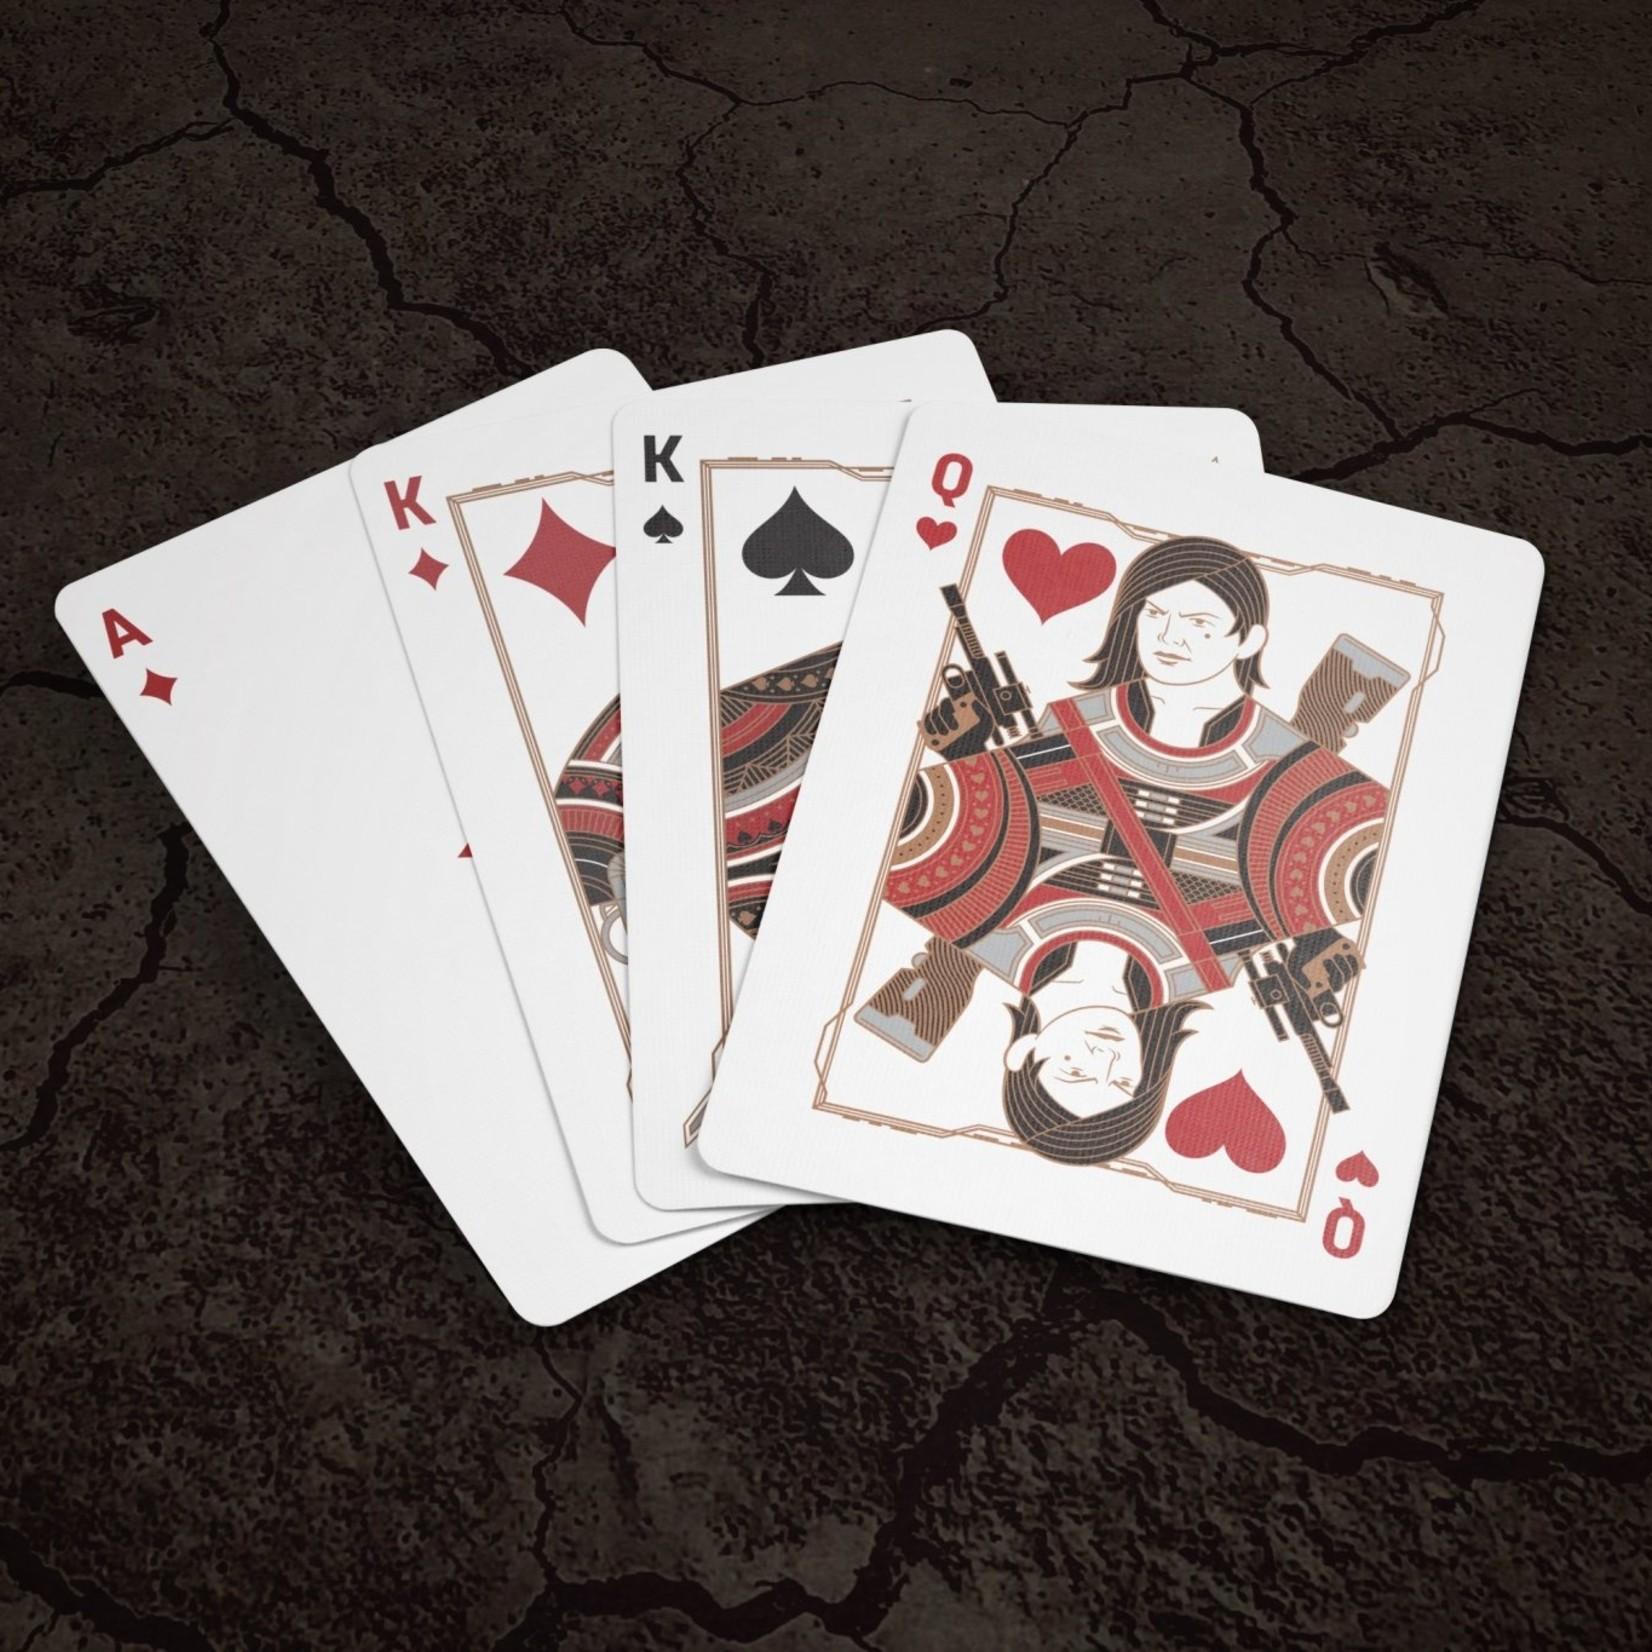 Theory 11 Theory 11 Playing Cards Mandolorian